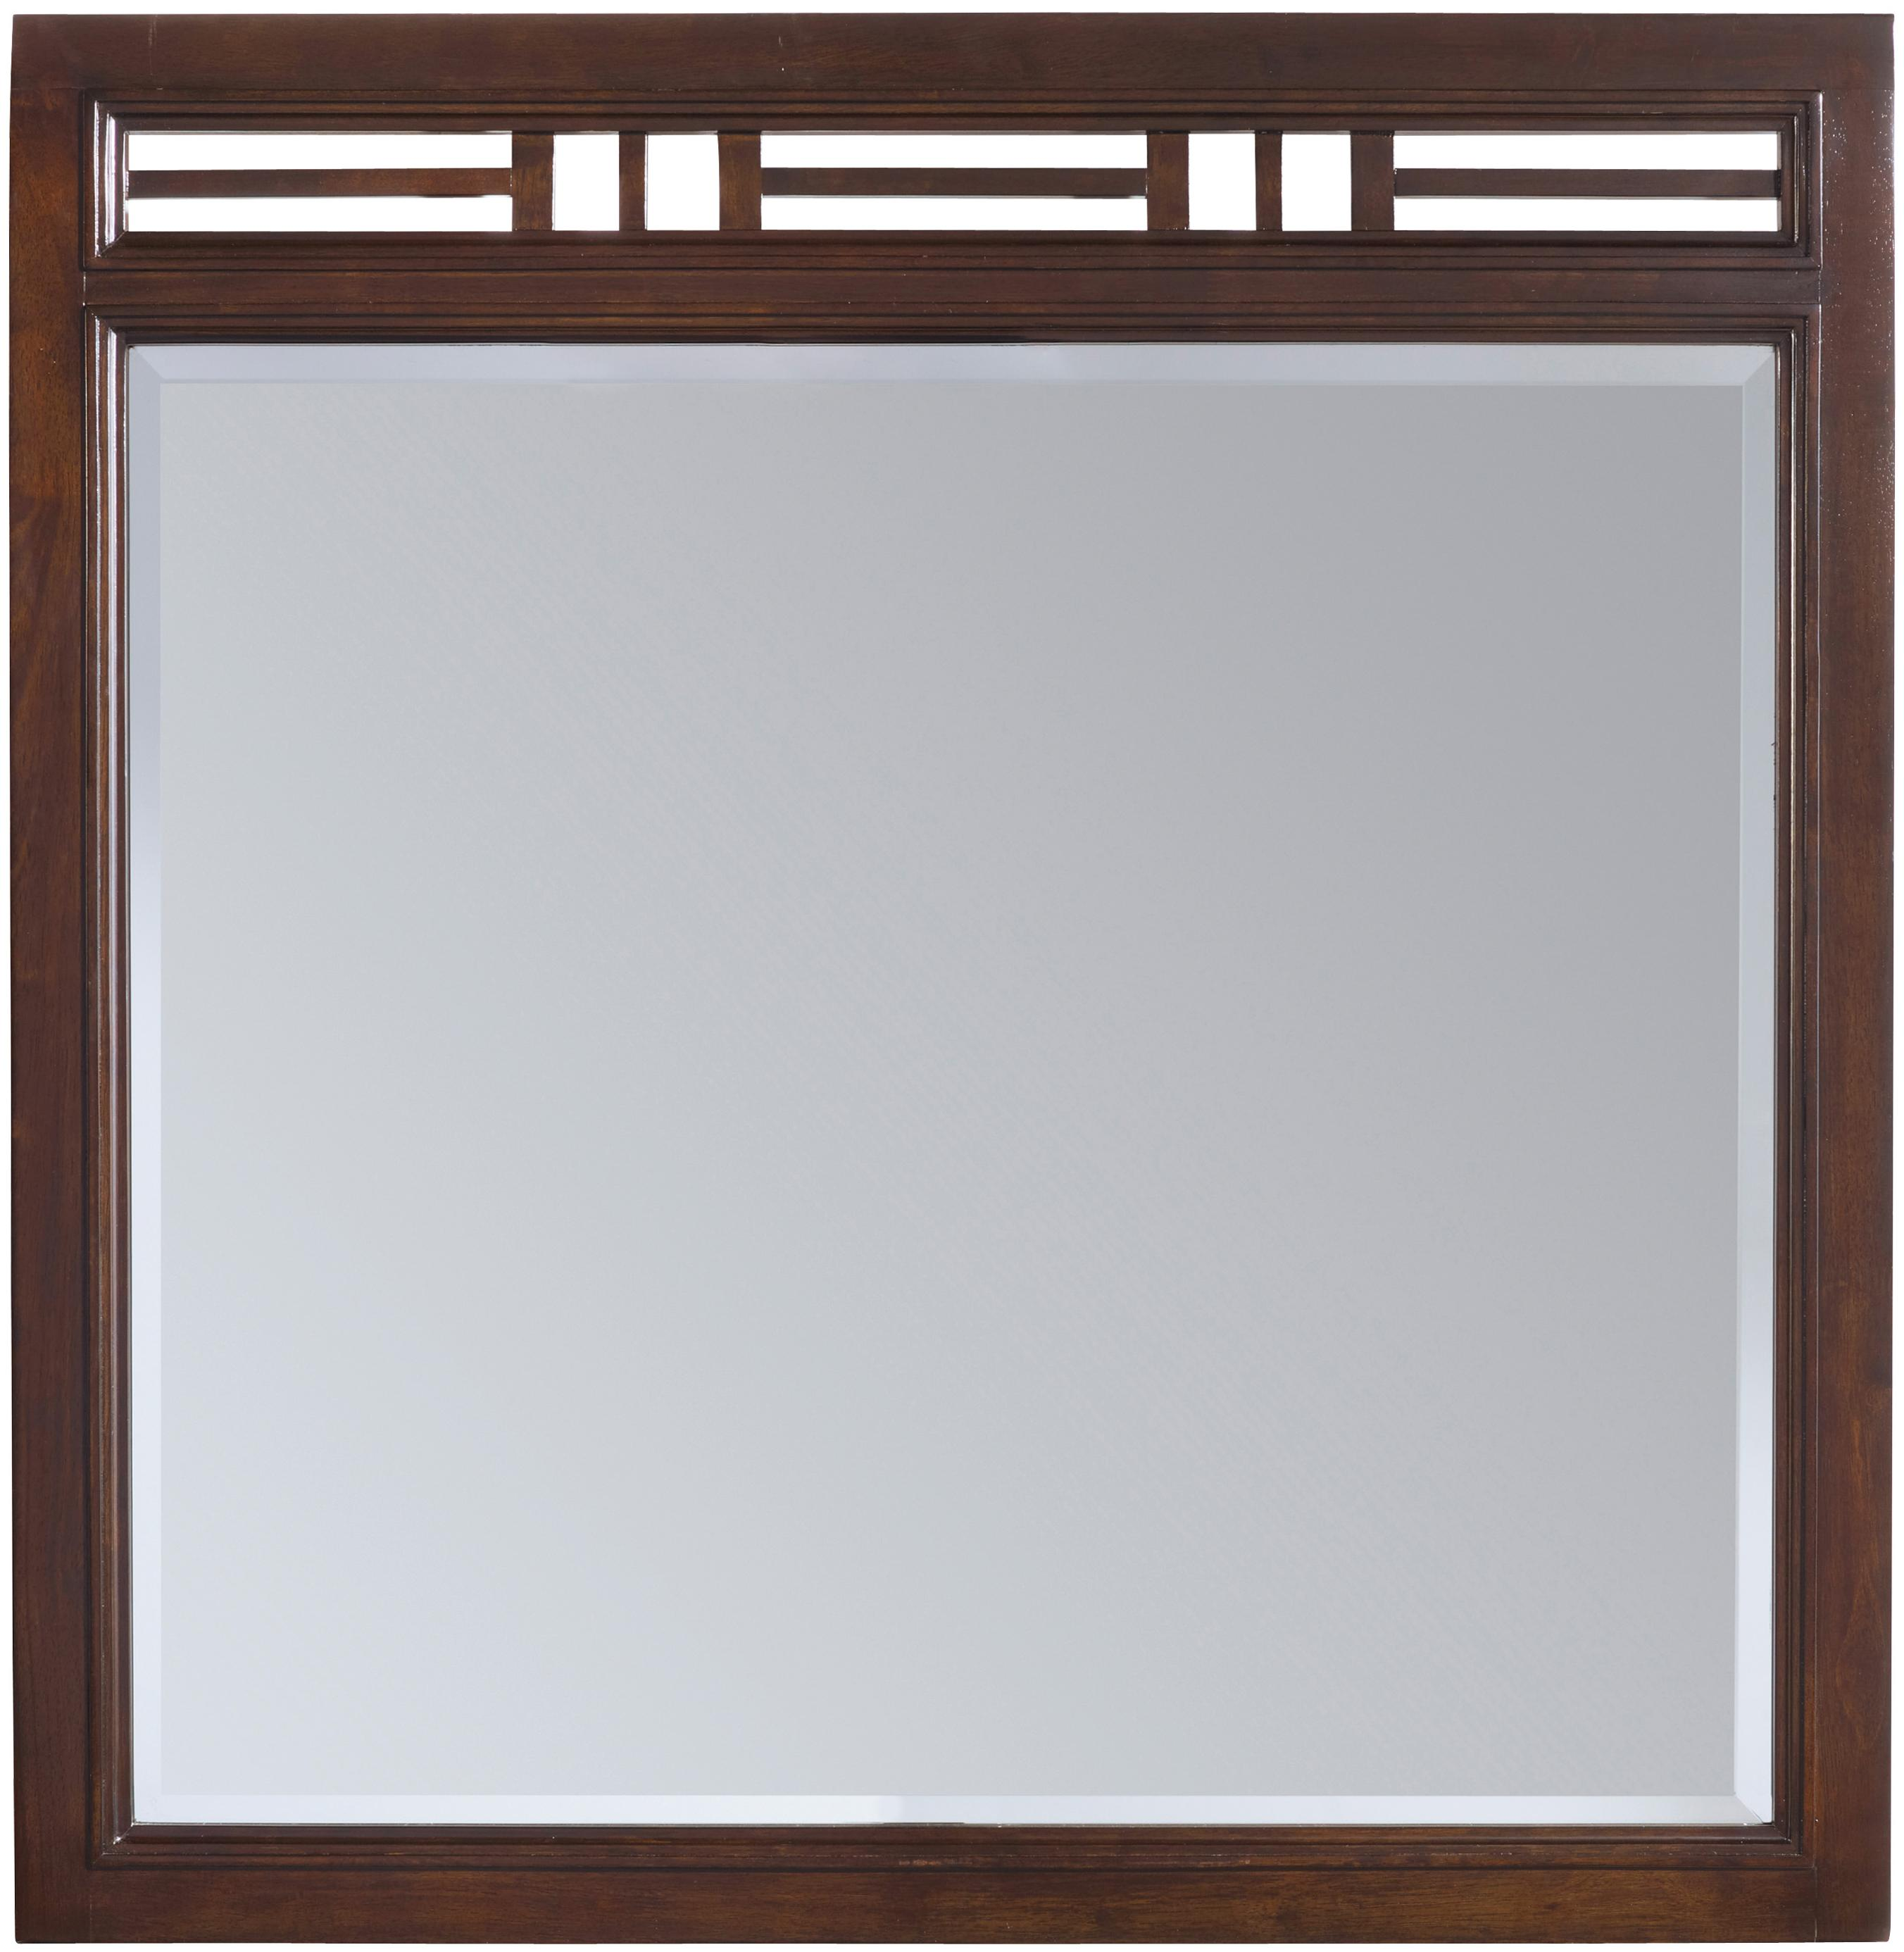 Hooker Furniture Ludlow Fretwork Mirror - Item Number: 1030-91009